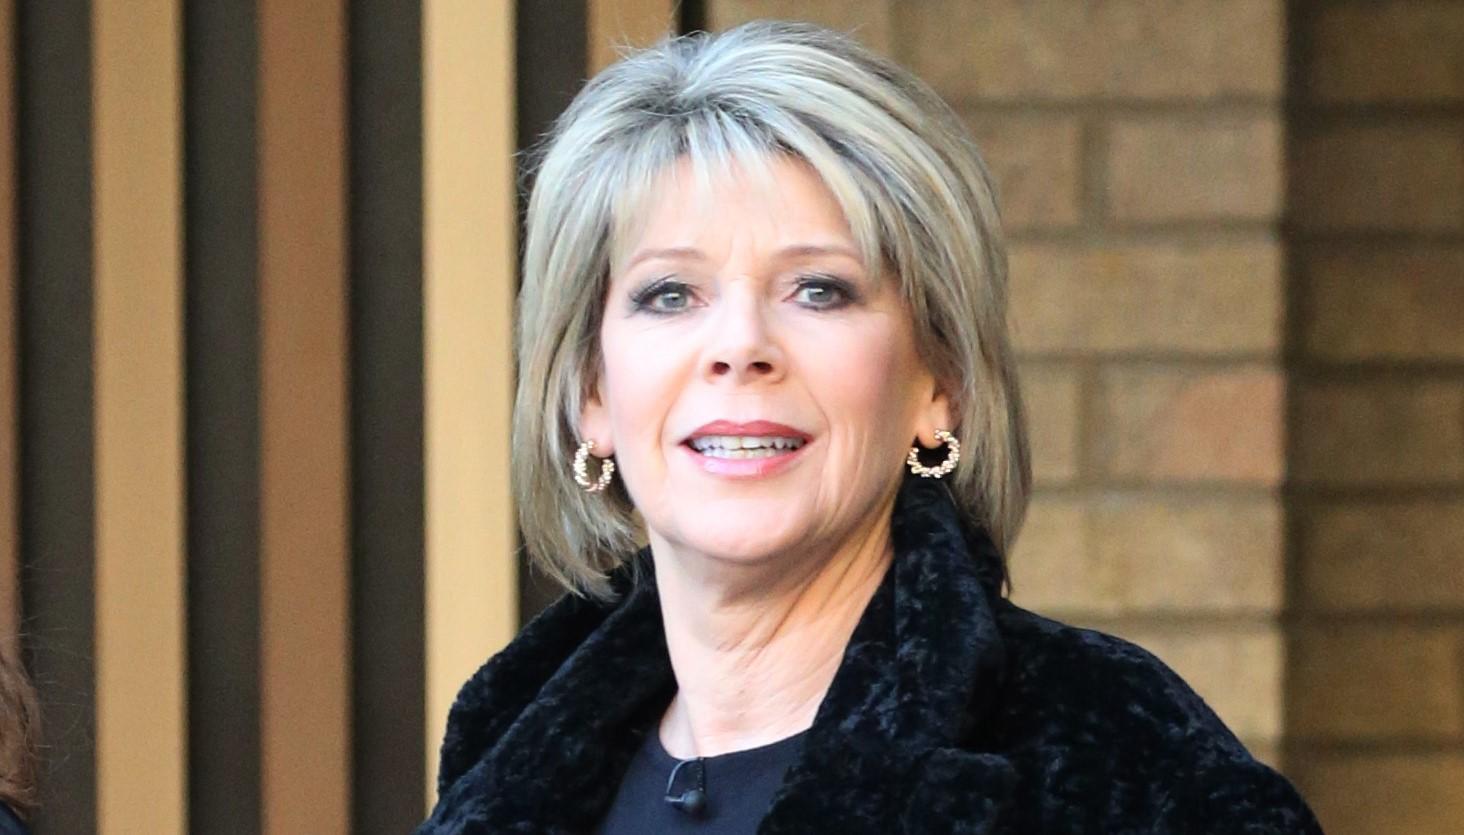 Ruth Langsford left heartbroken as sister Julia dies